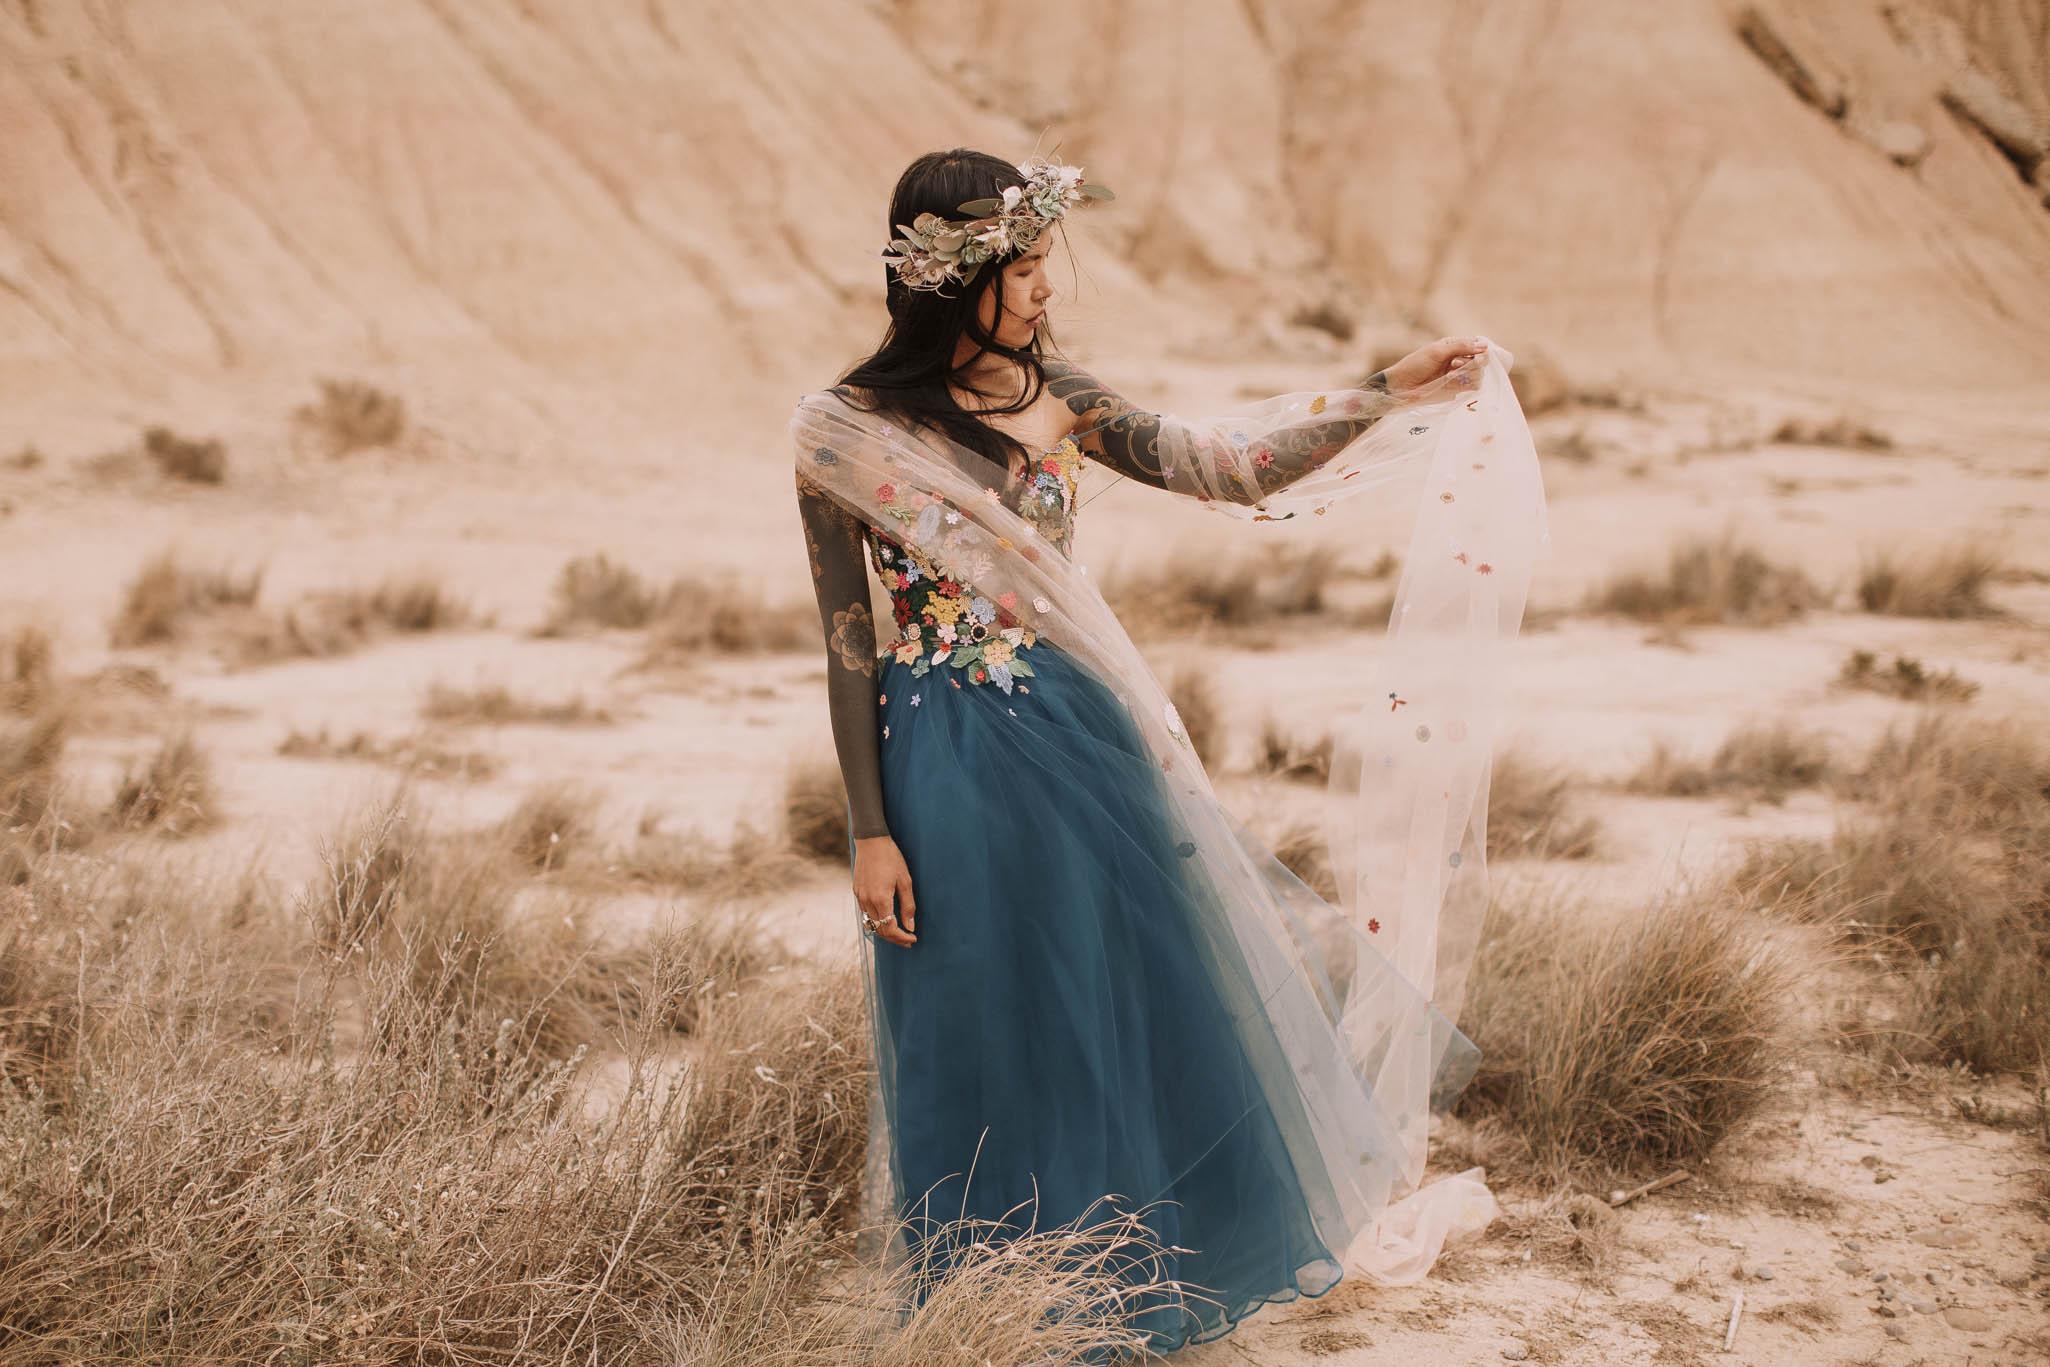 Spain-wedding-photographer-bardenas-reales-jeremy-boyer-photographe-mariage-bordeaux-floral-wedding-dress-robe-69.jpg